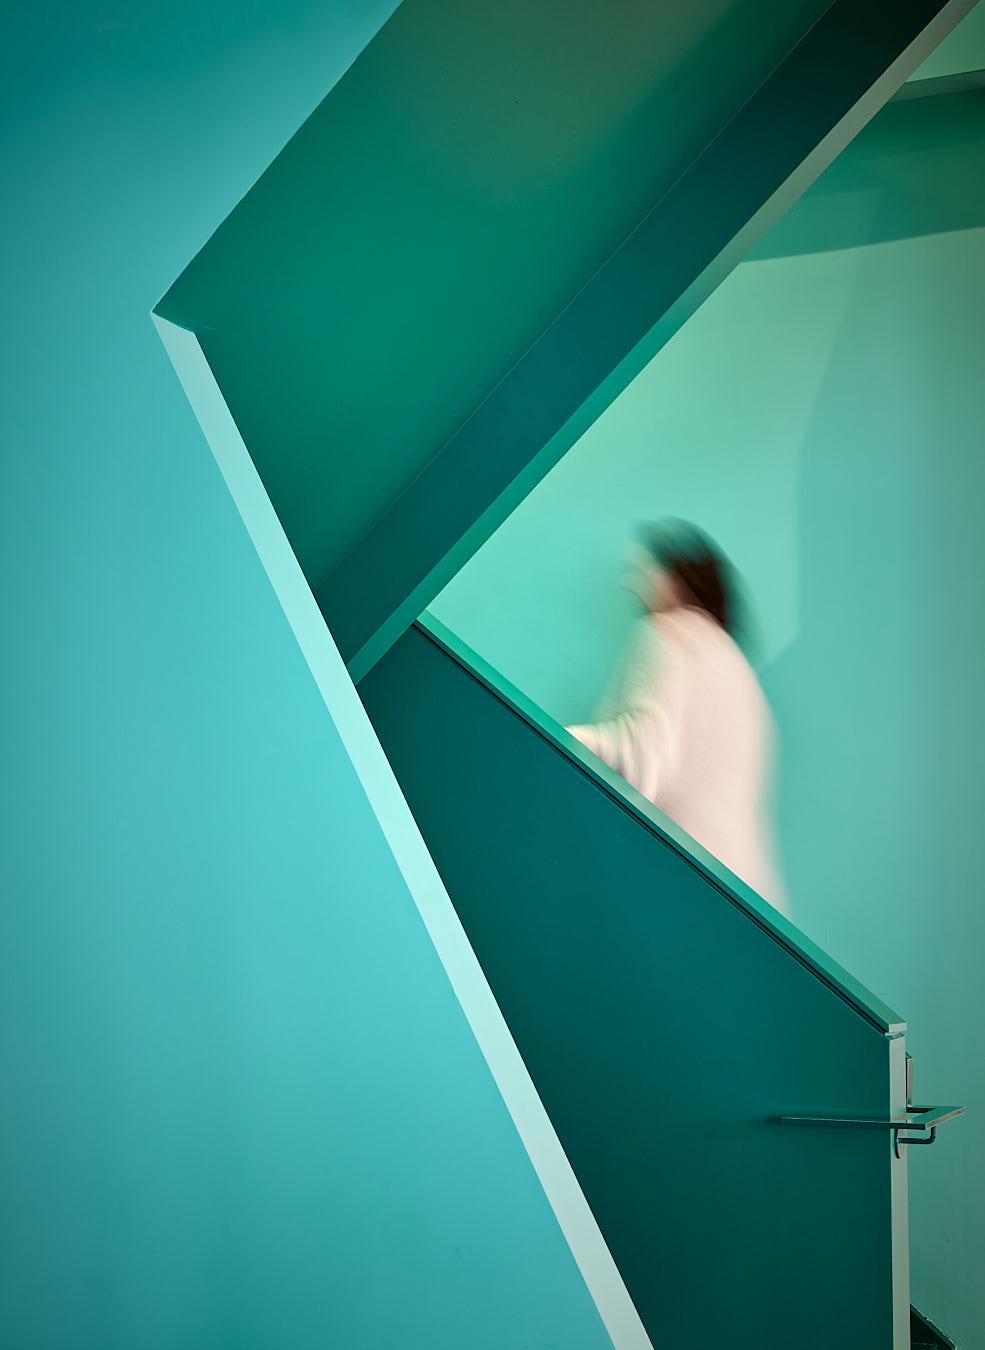 025-Lebel Bouliane Lift.jpg